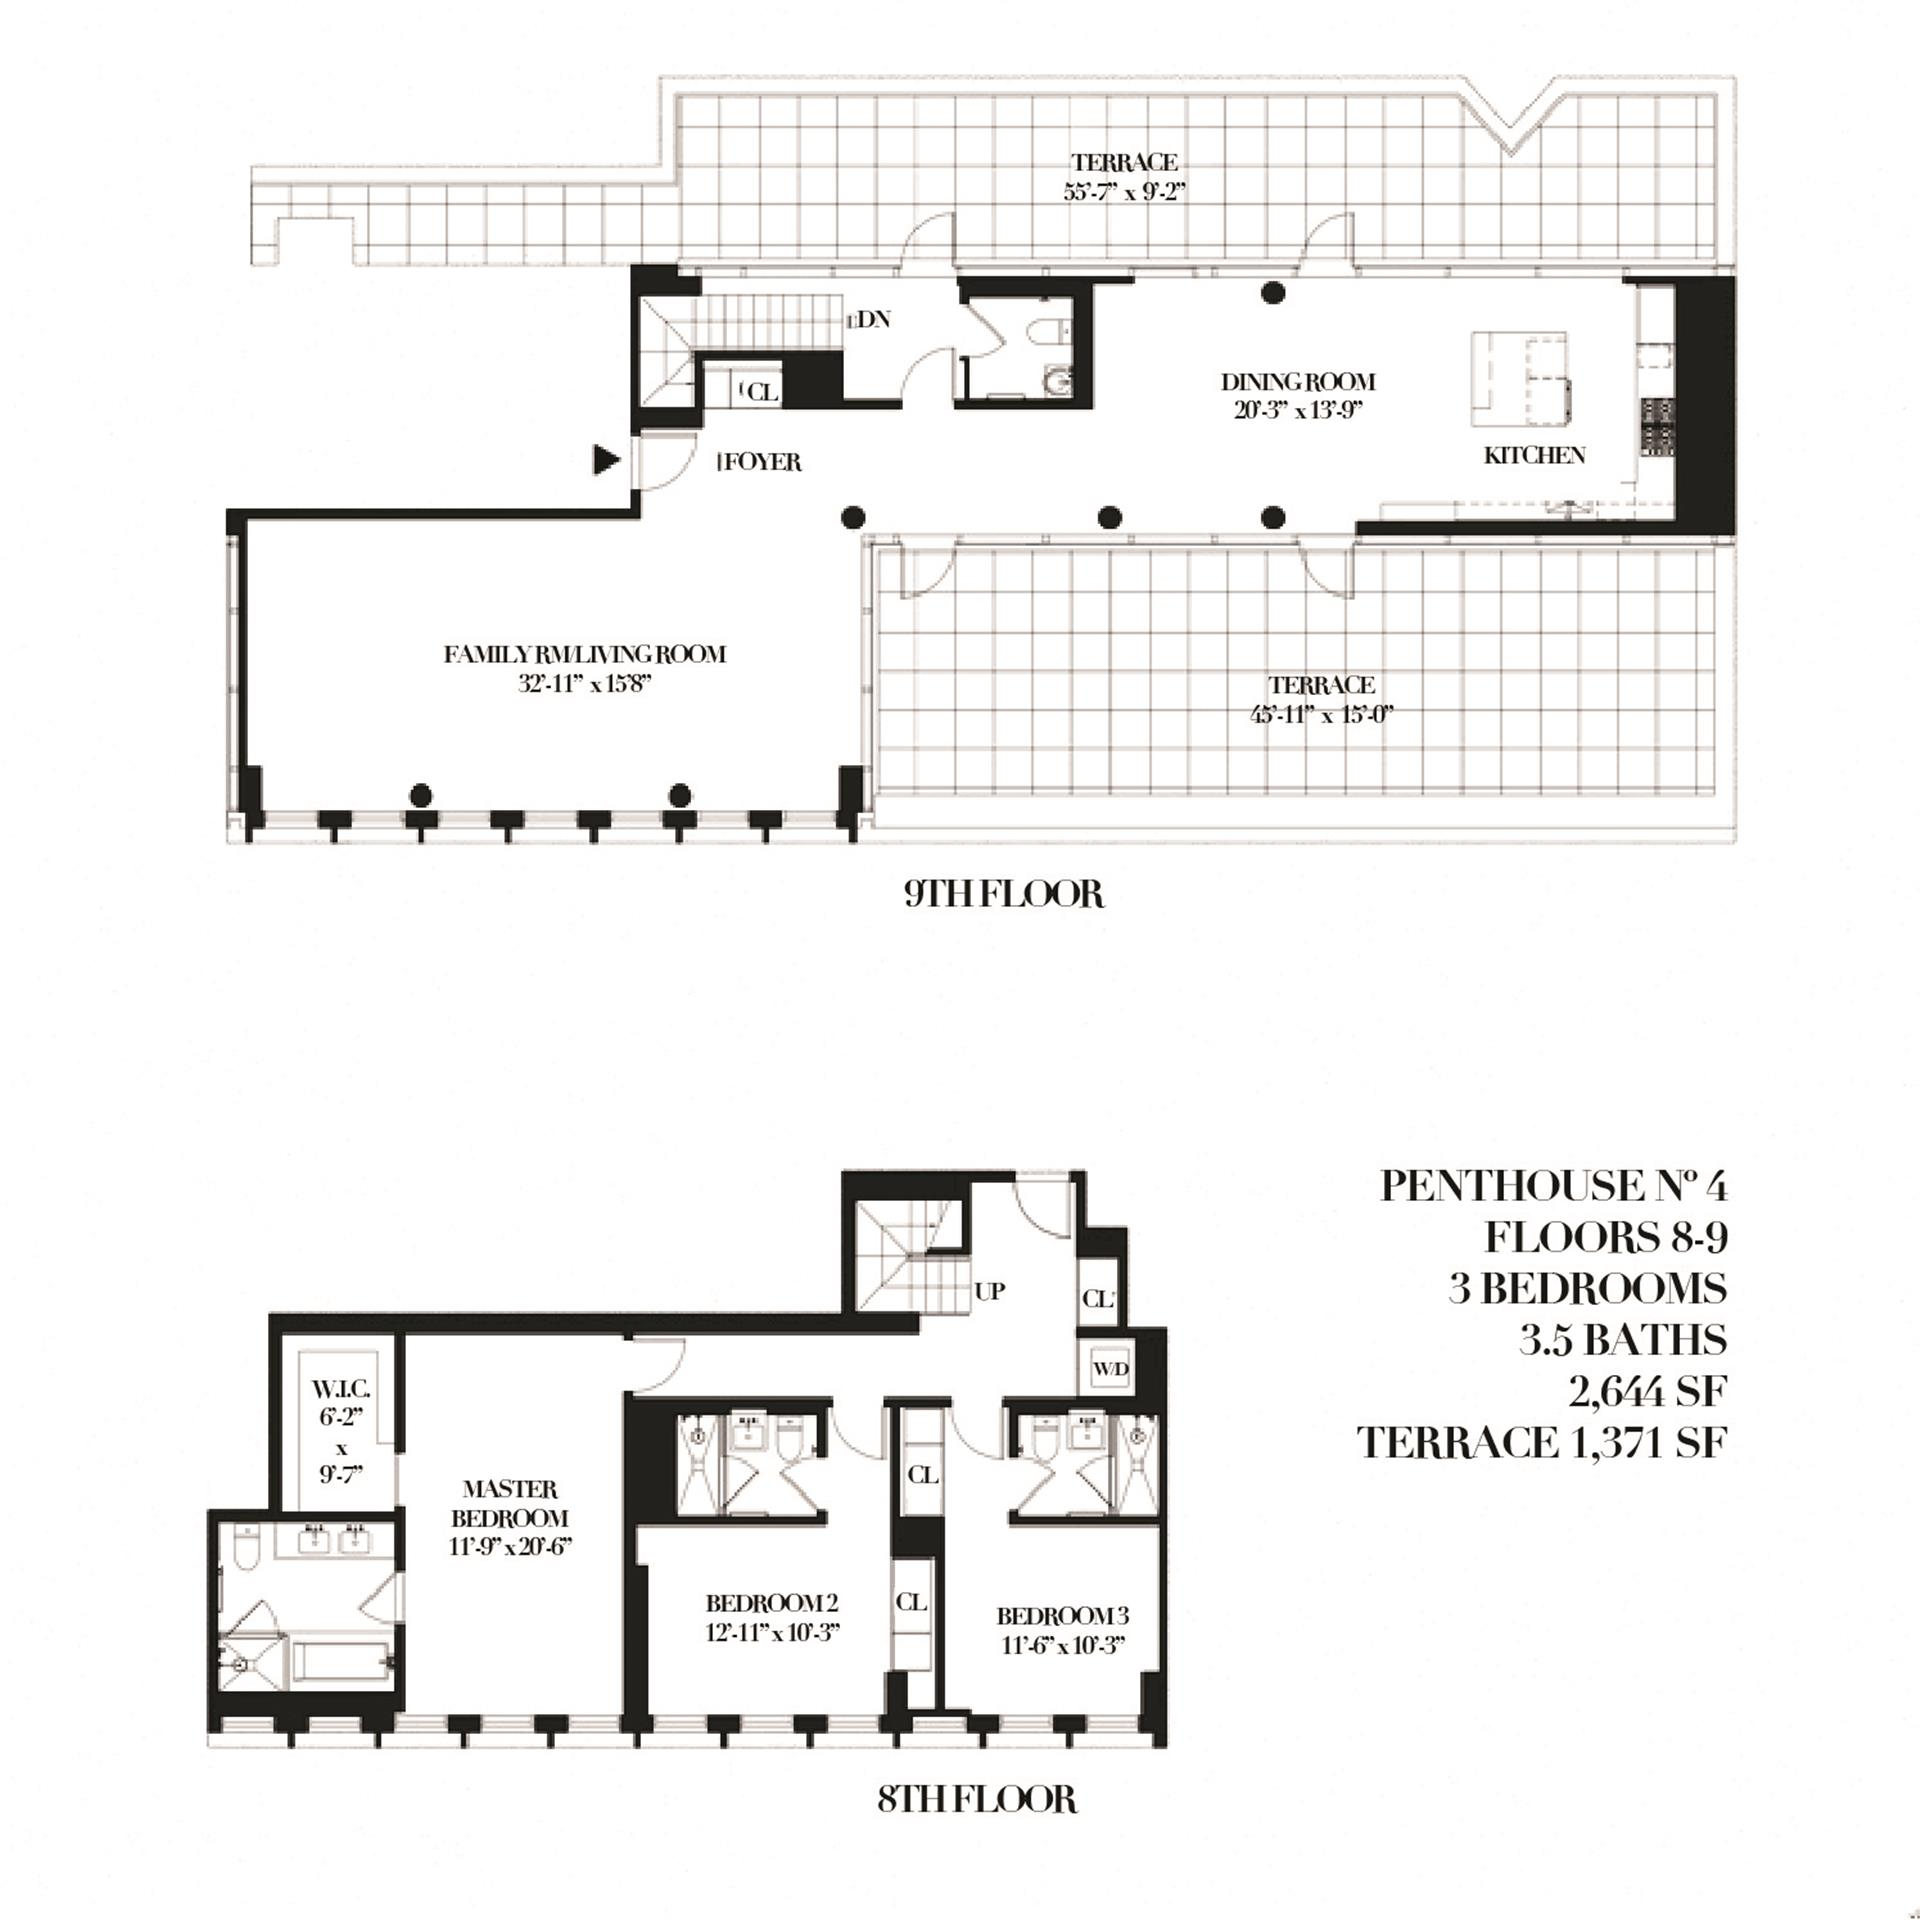 Floor plan of THE RENWICK, 15 Renwick St, PH4 - SoHo - Nolita, New York